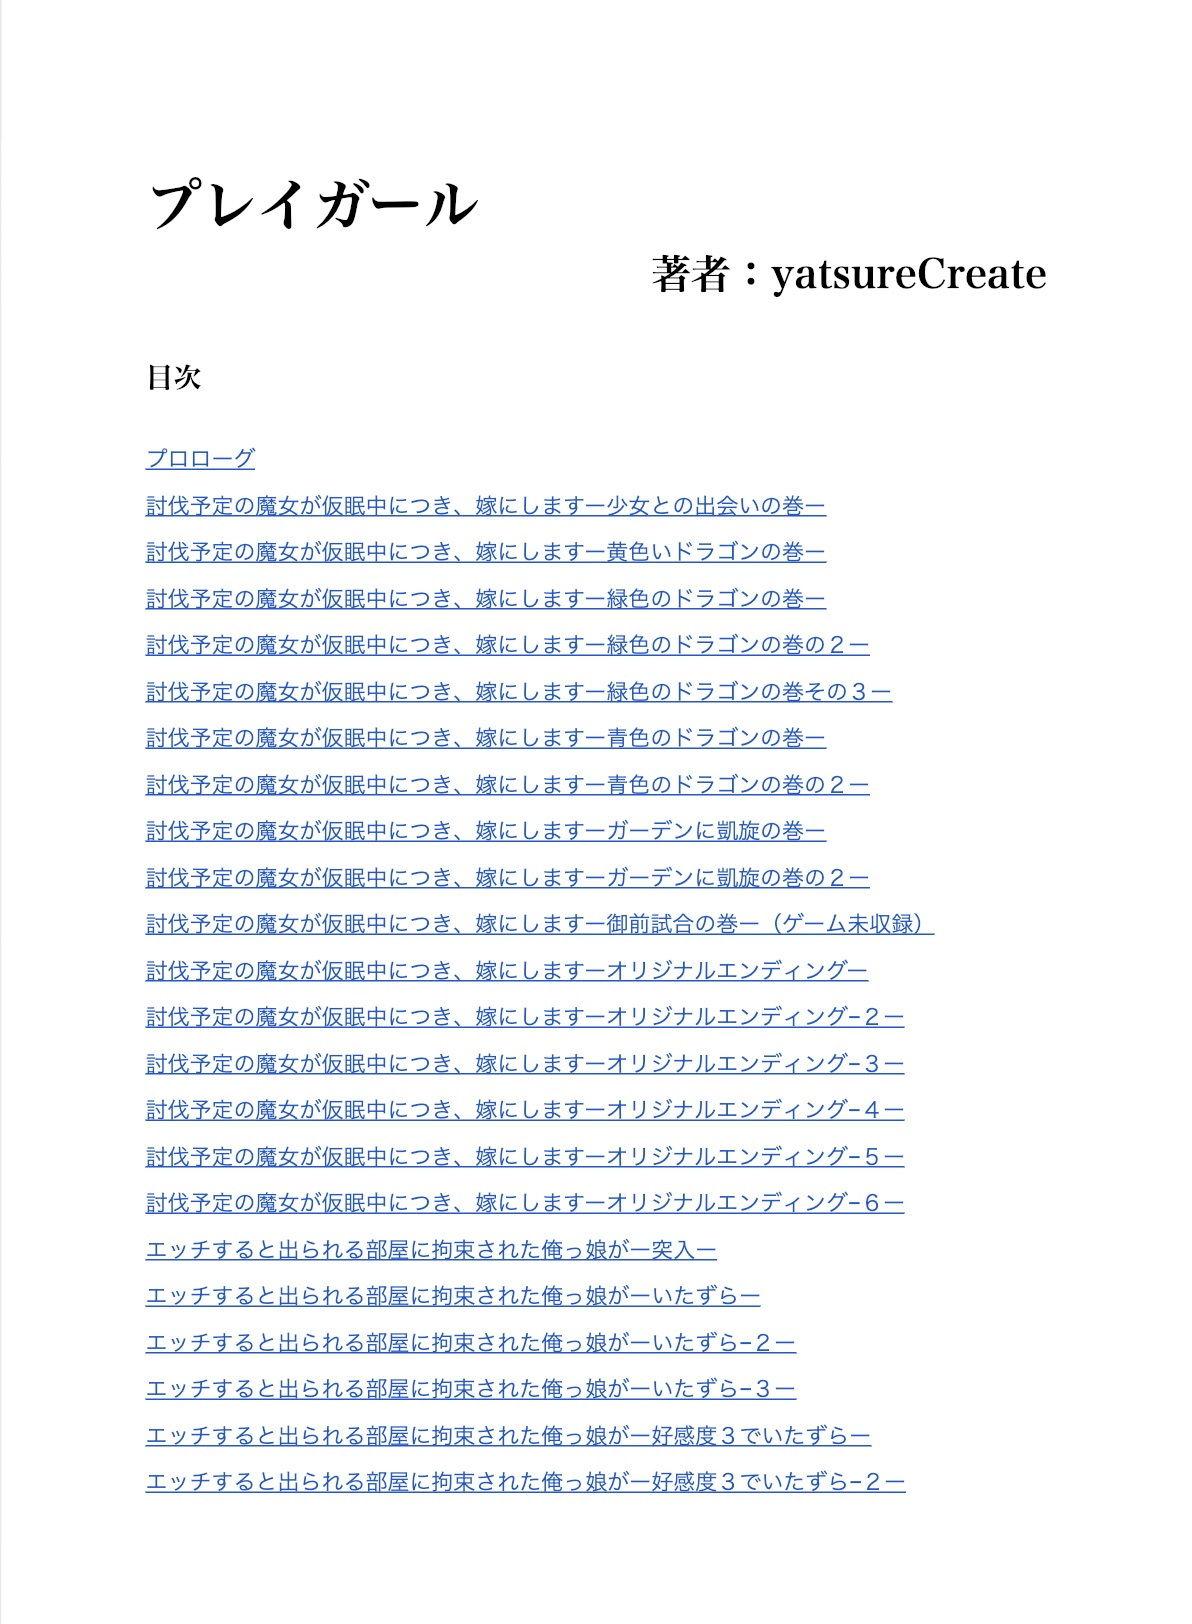 【yatsureCreate 同人】【ノベル】プレイガール